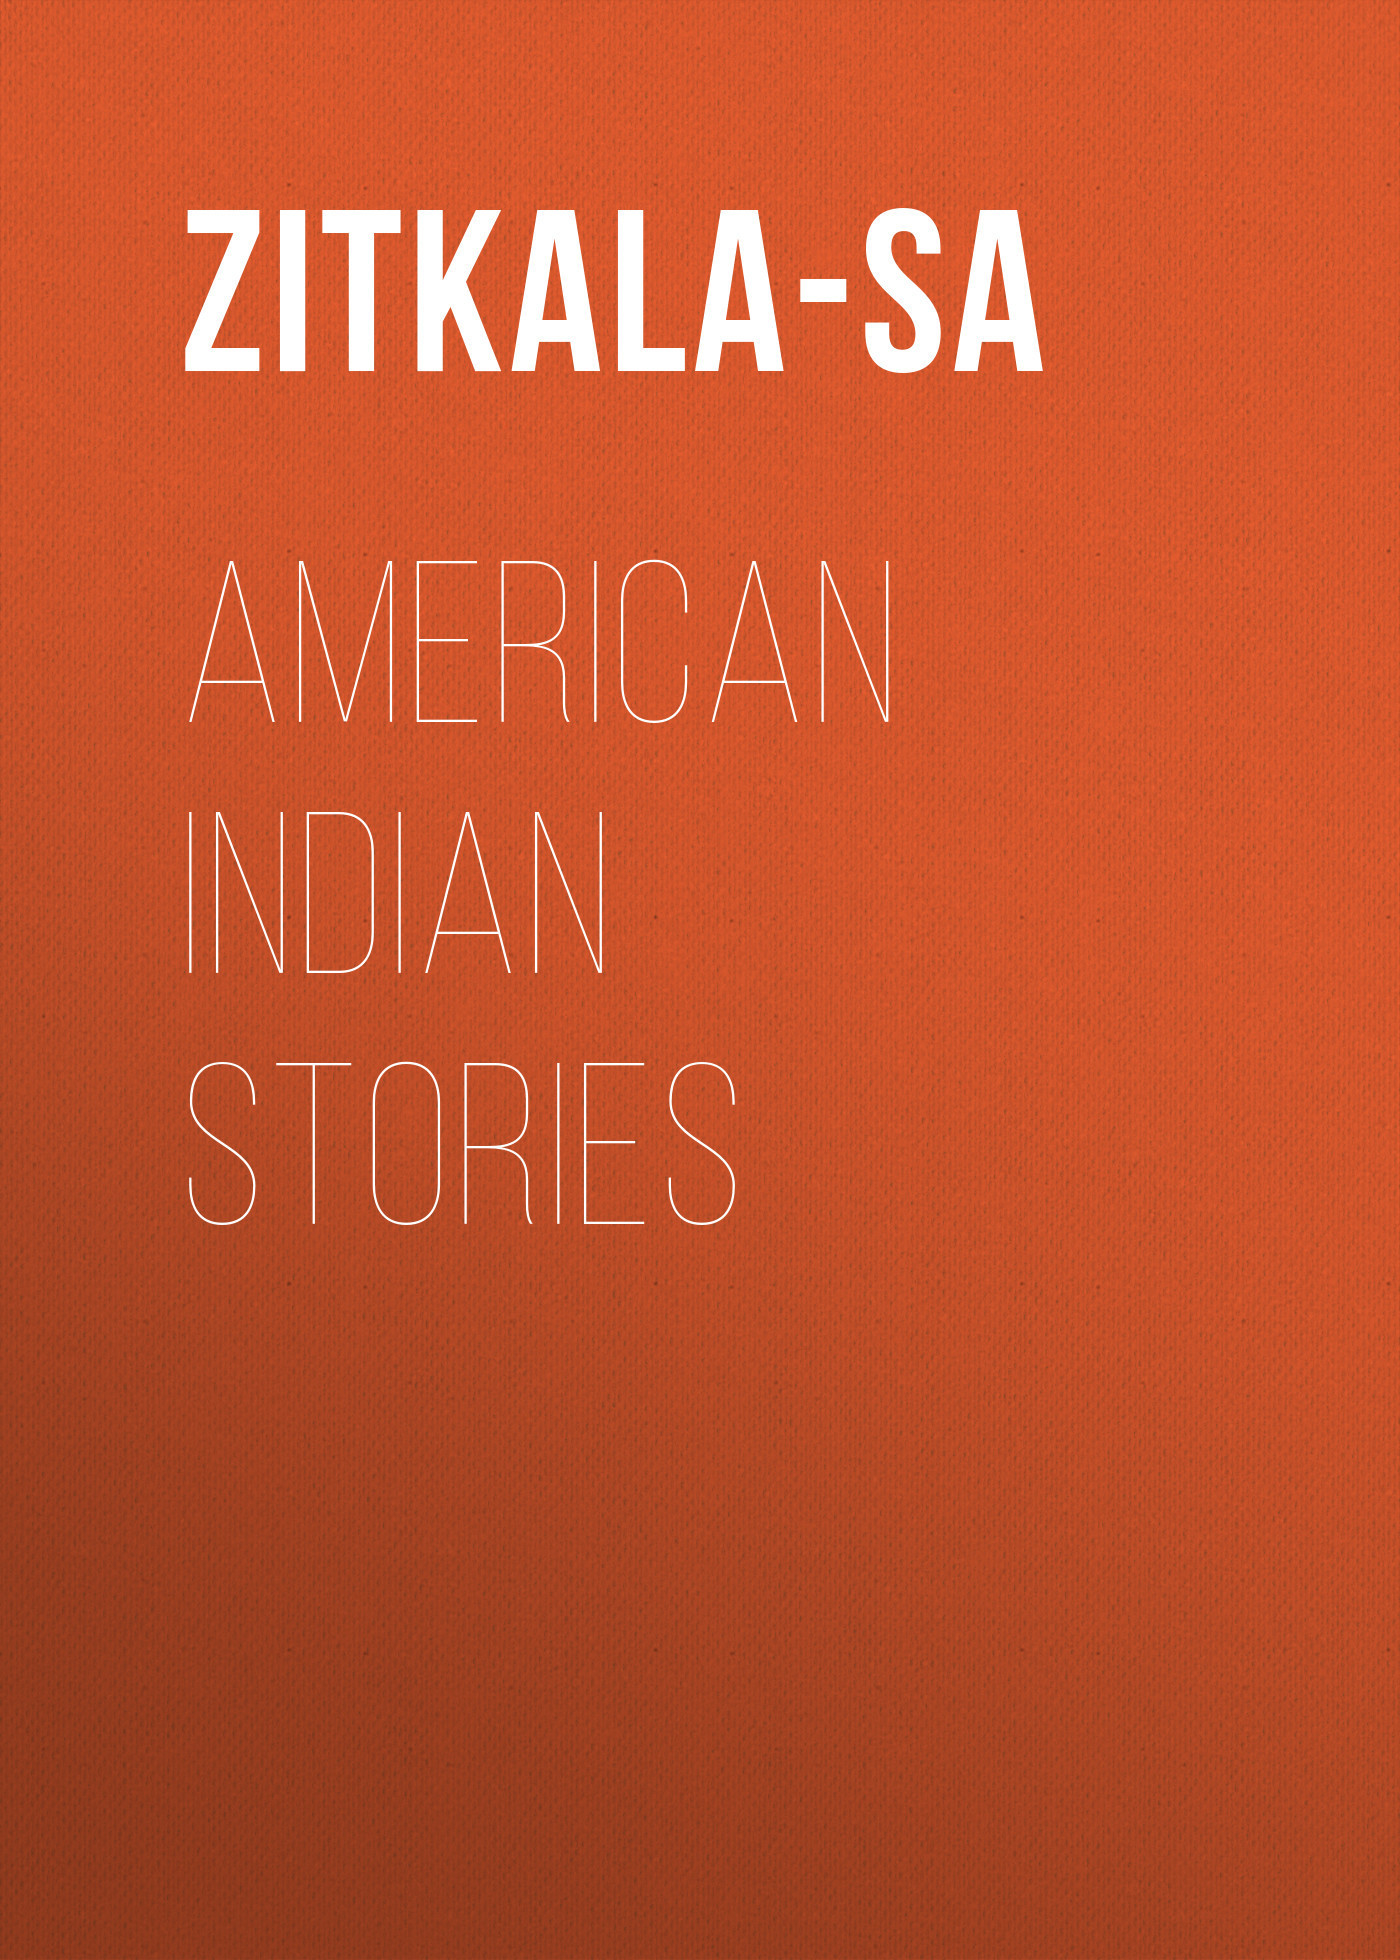 Zitkala-Sa American Indian Stories vitaly mushkin erotic stories top ten